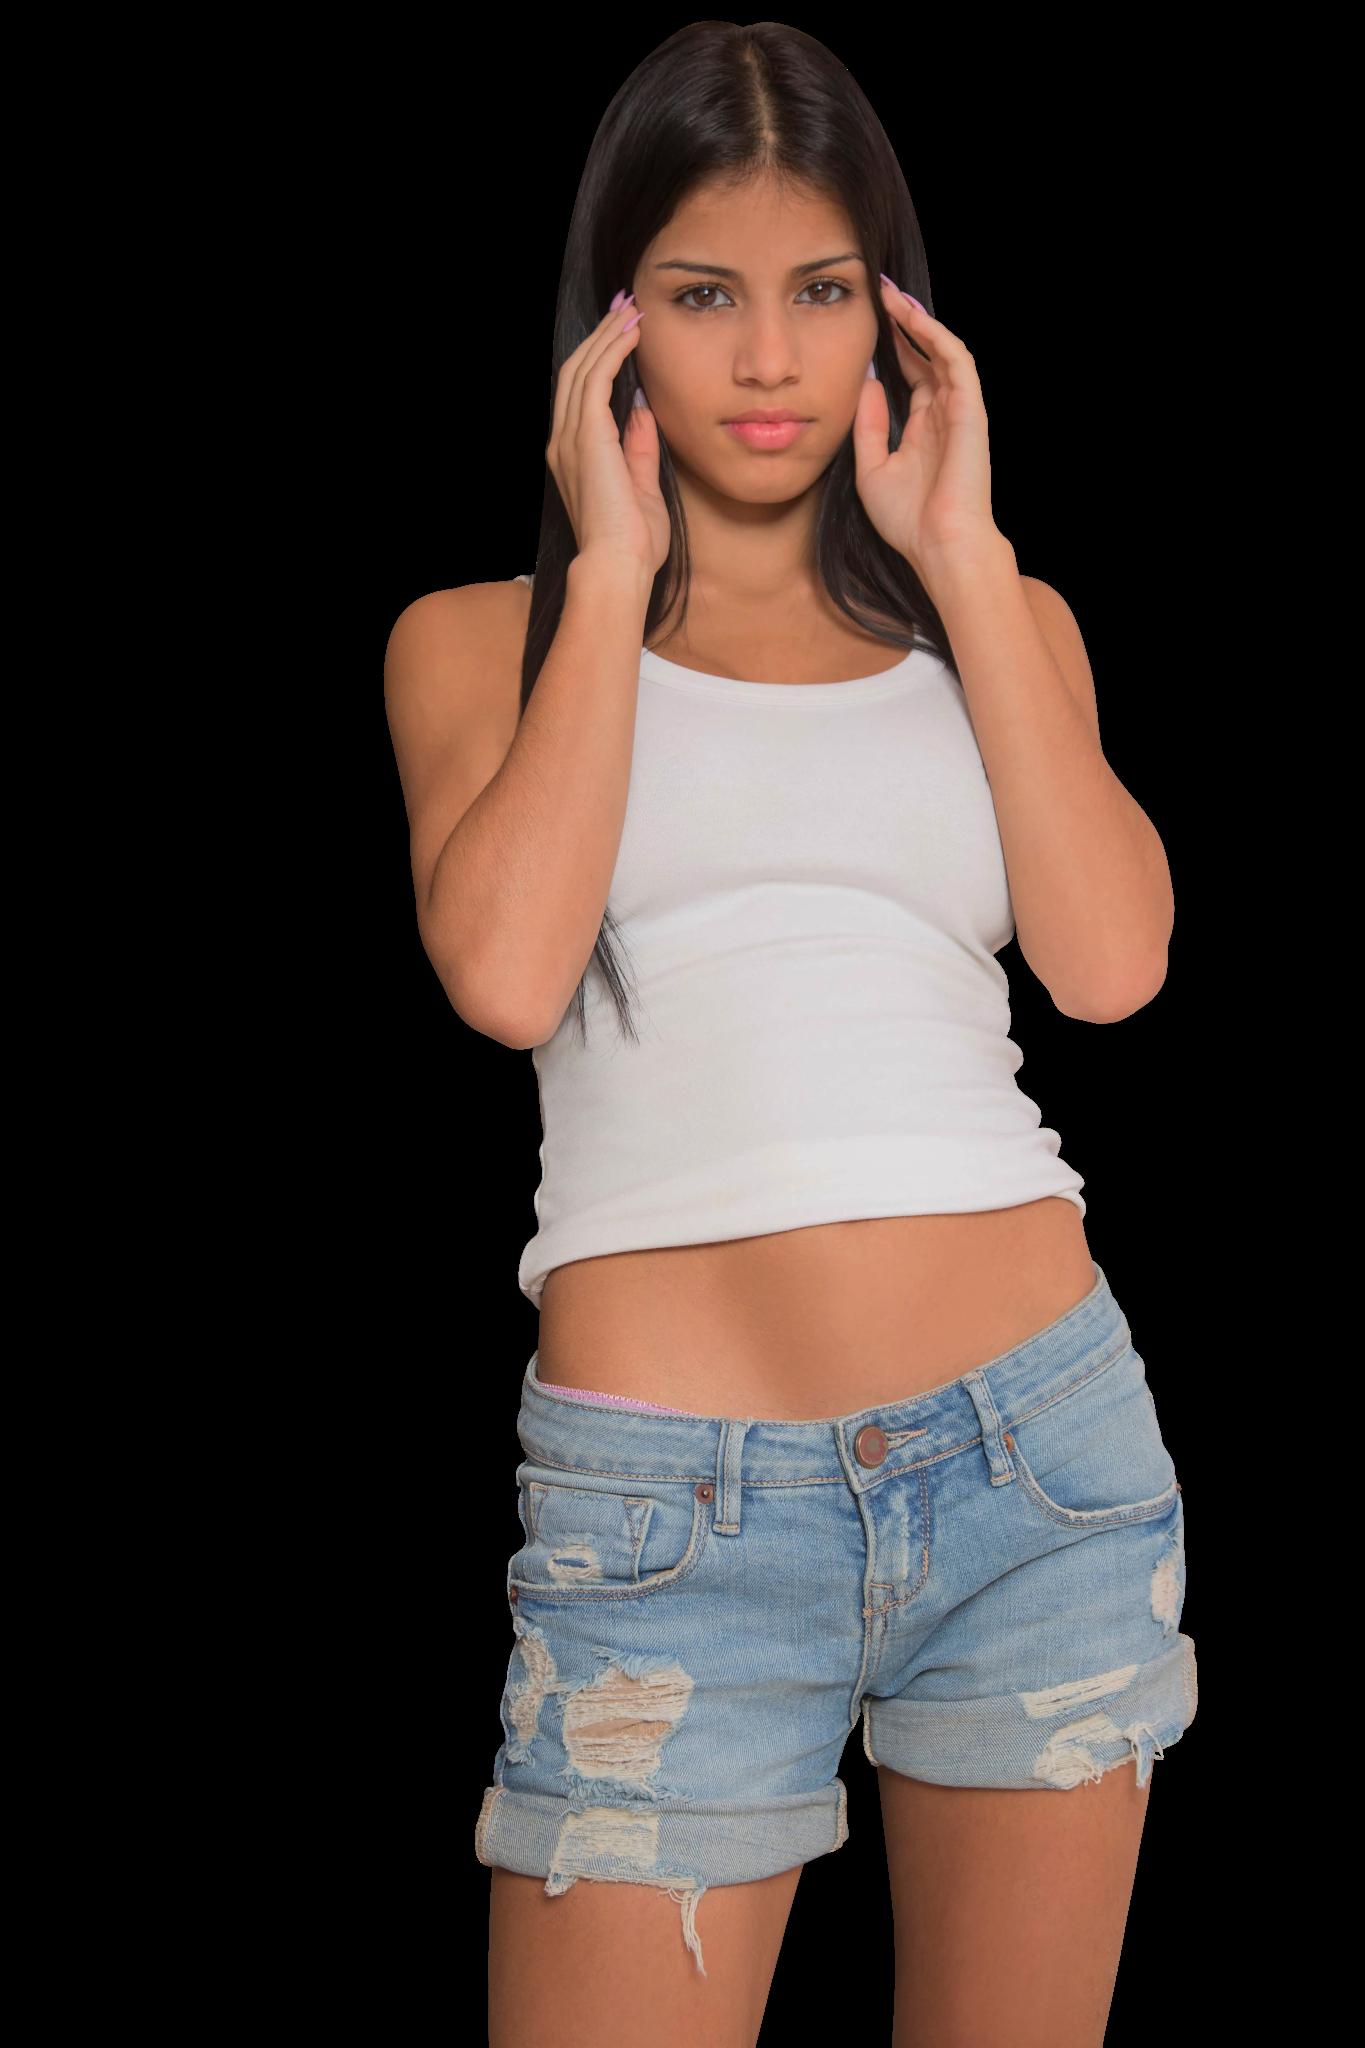 Models - Denisse Gomez